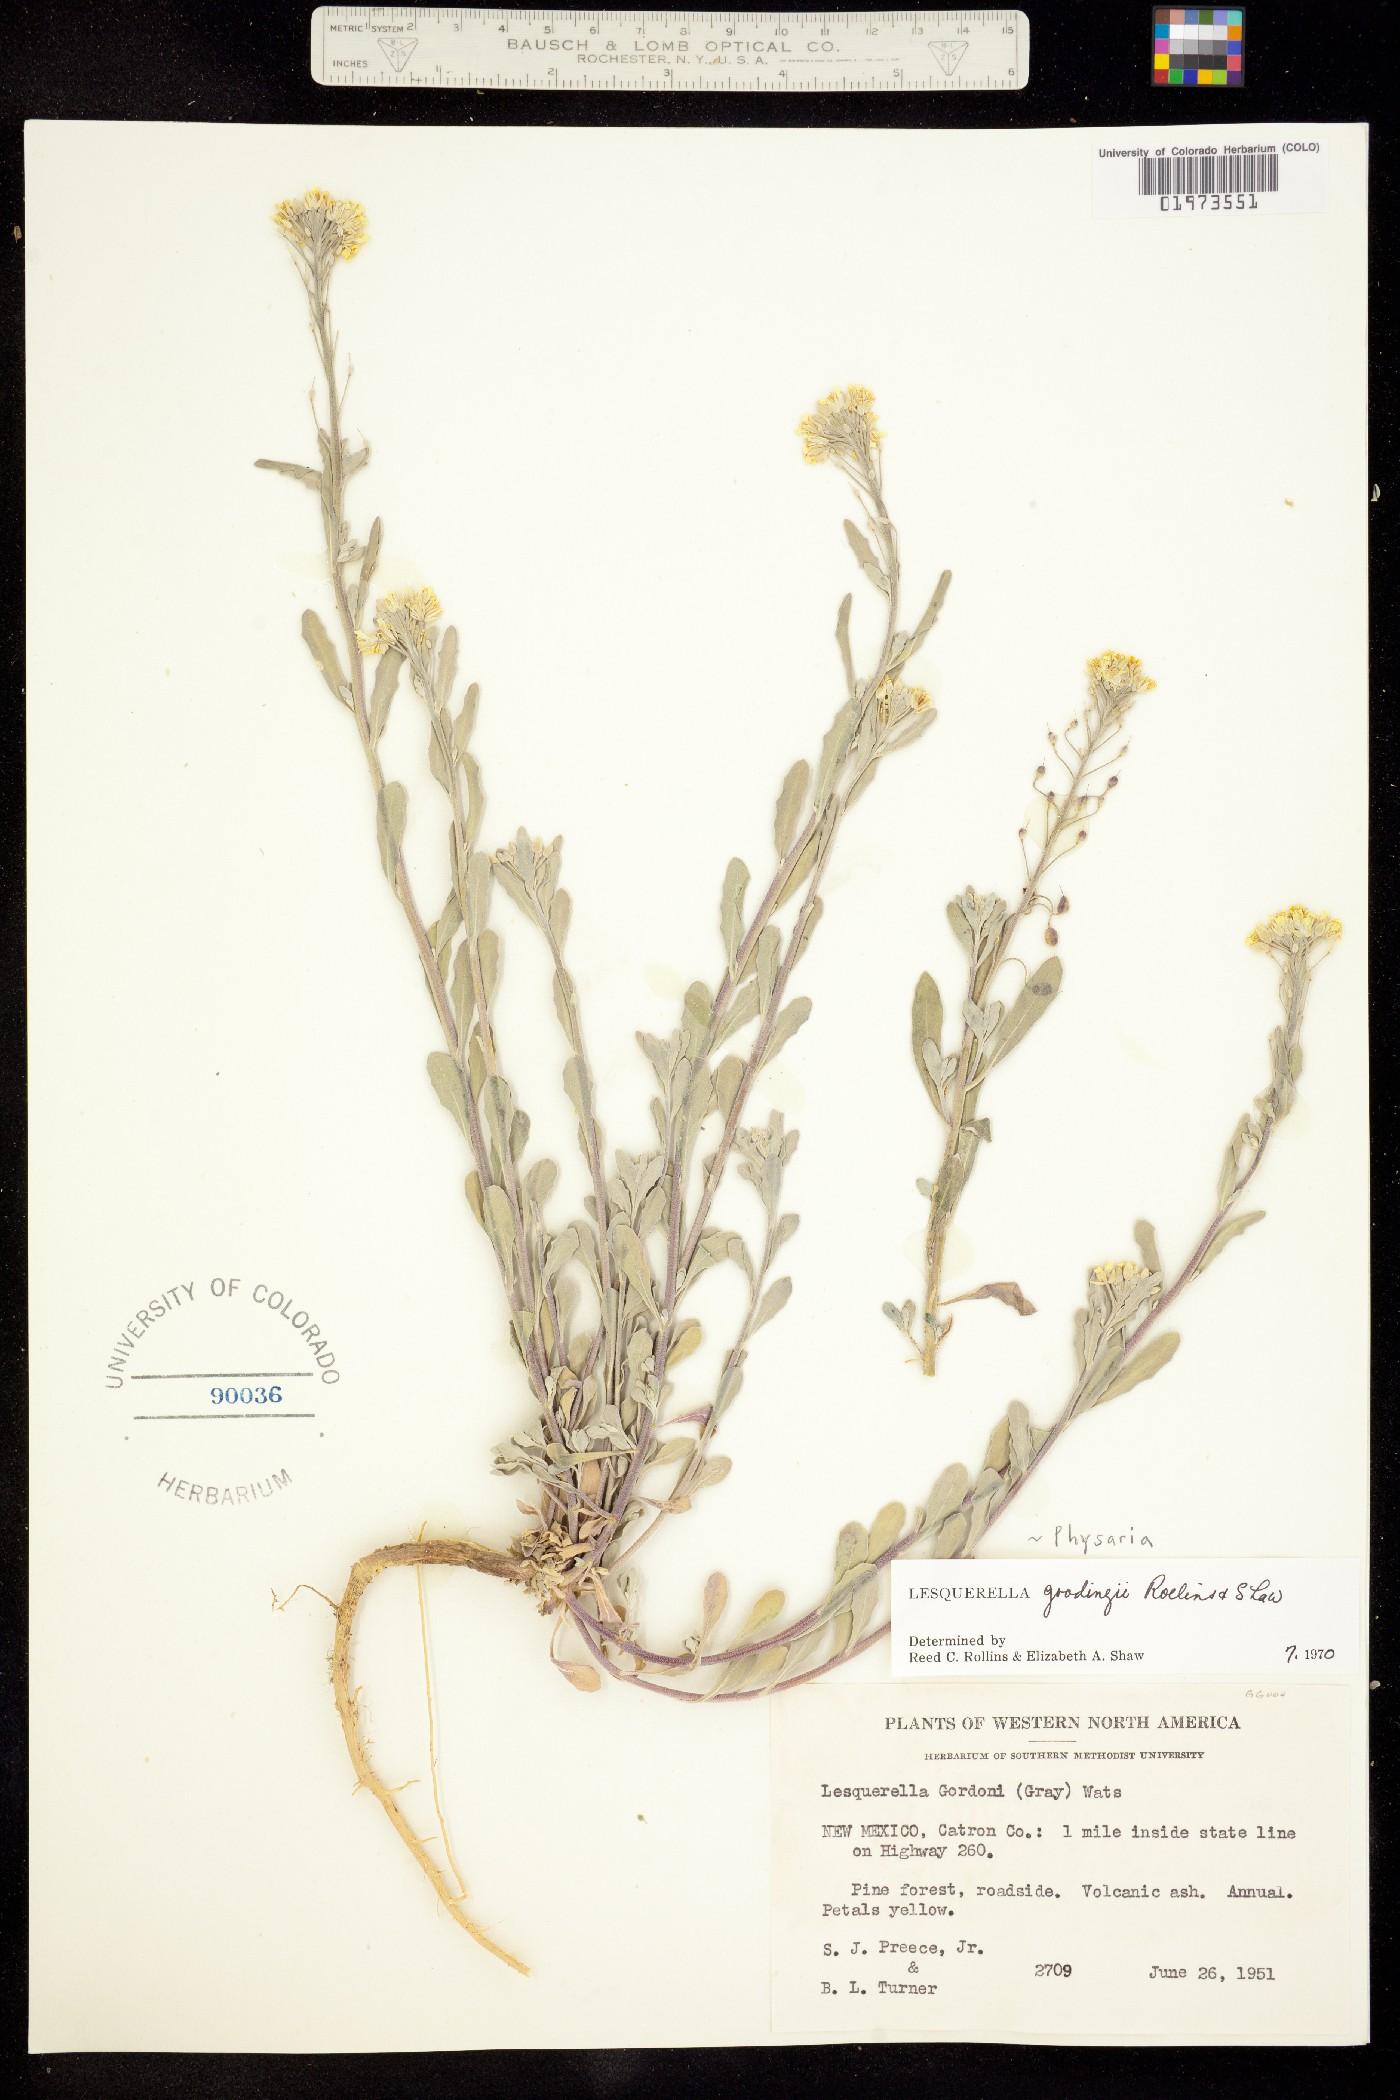 Physaria gooddingii image